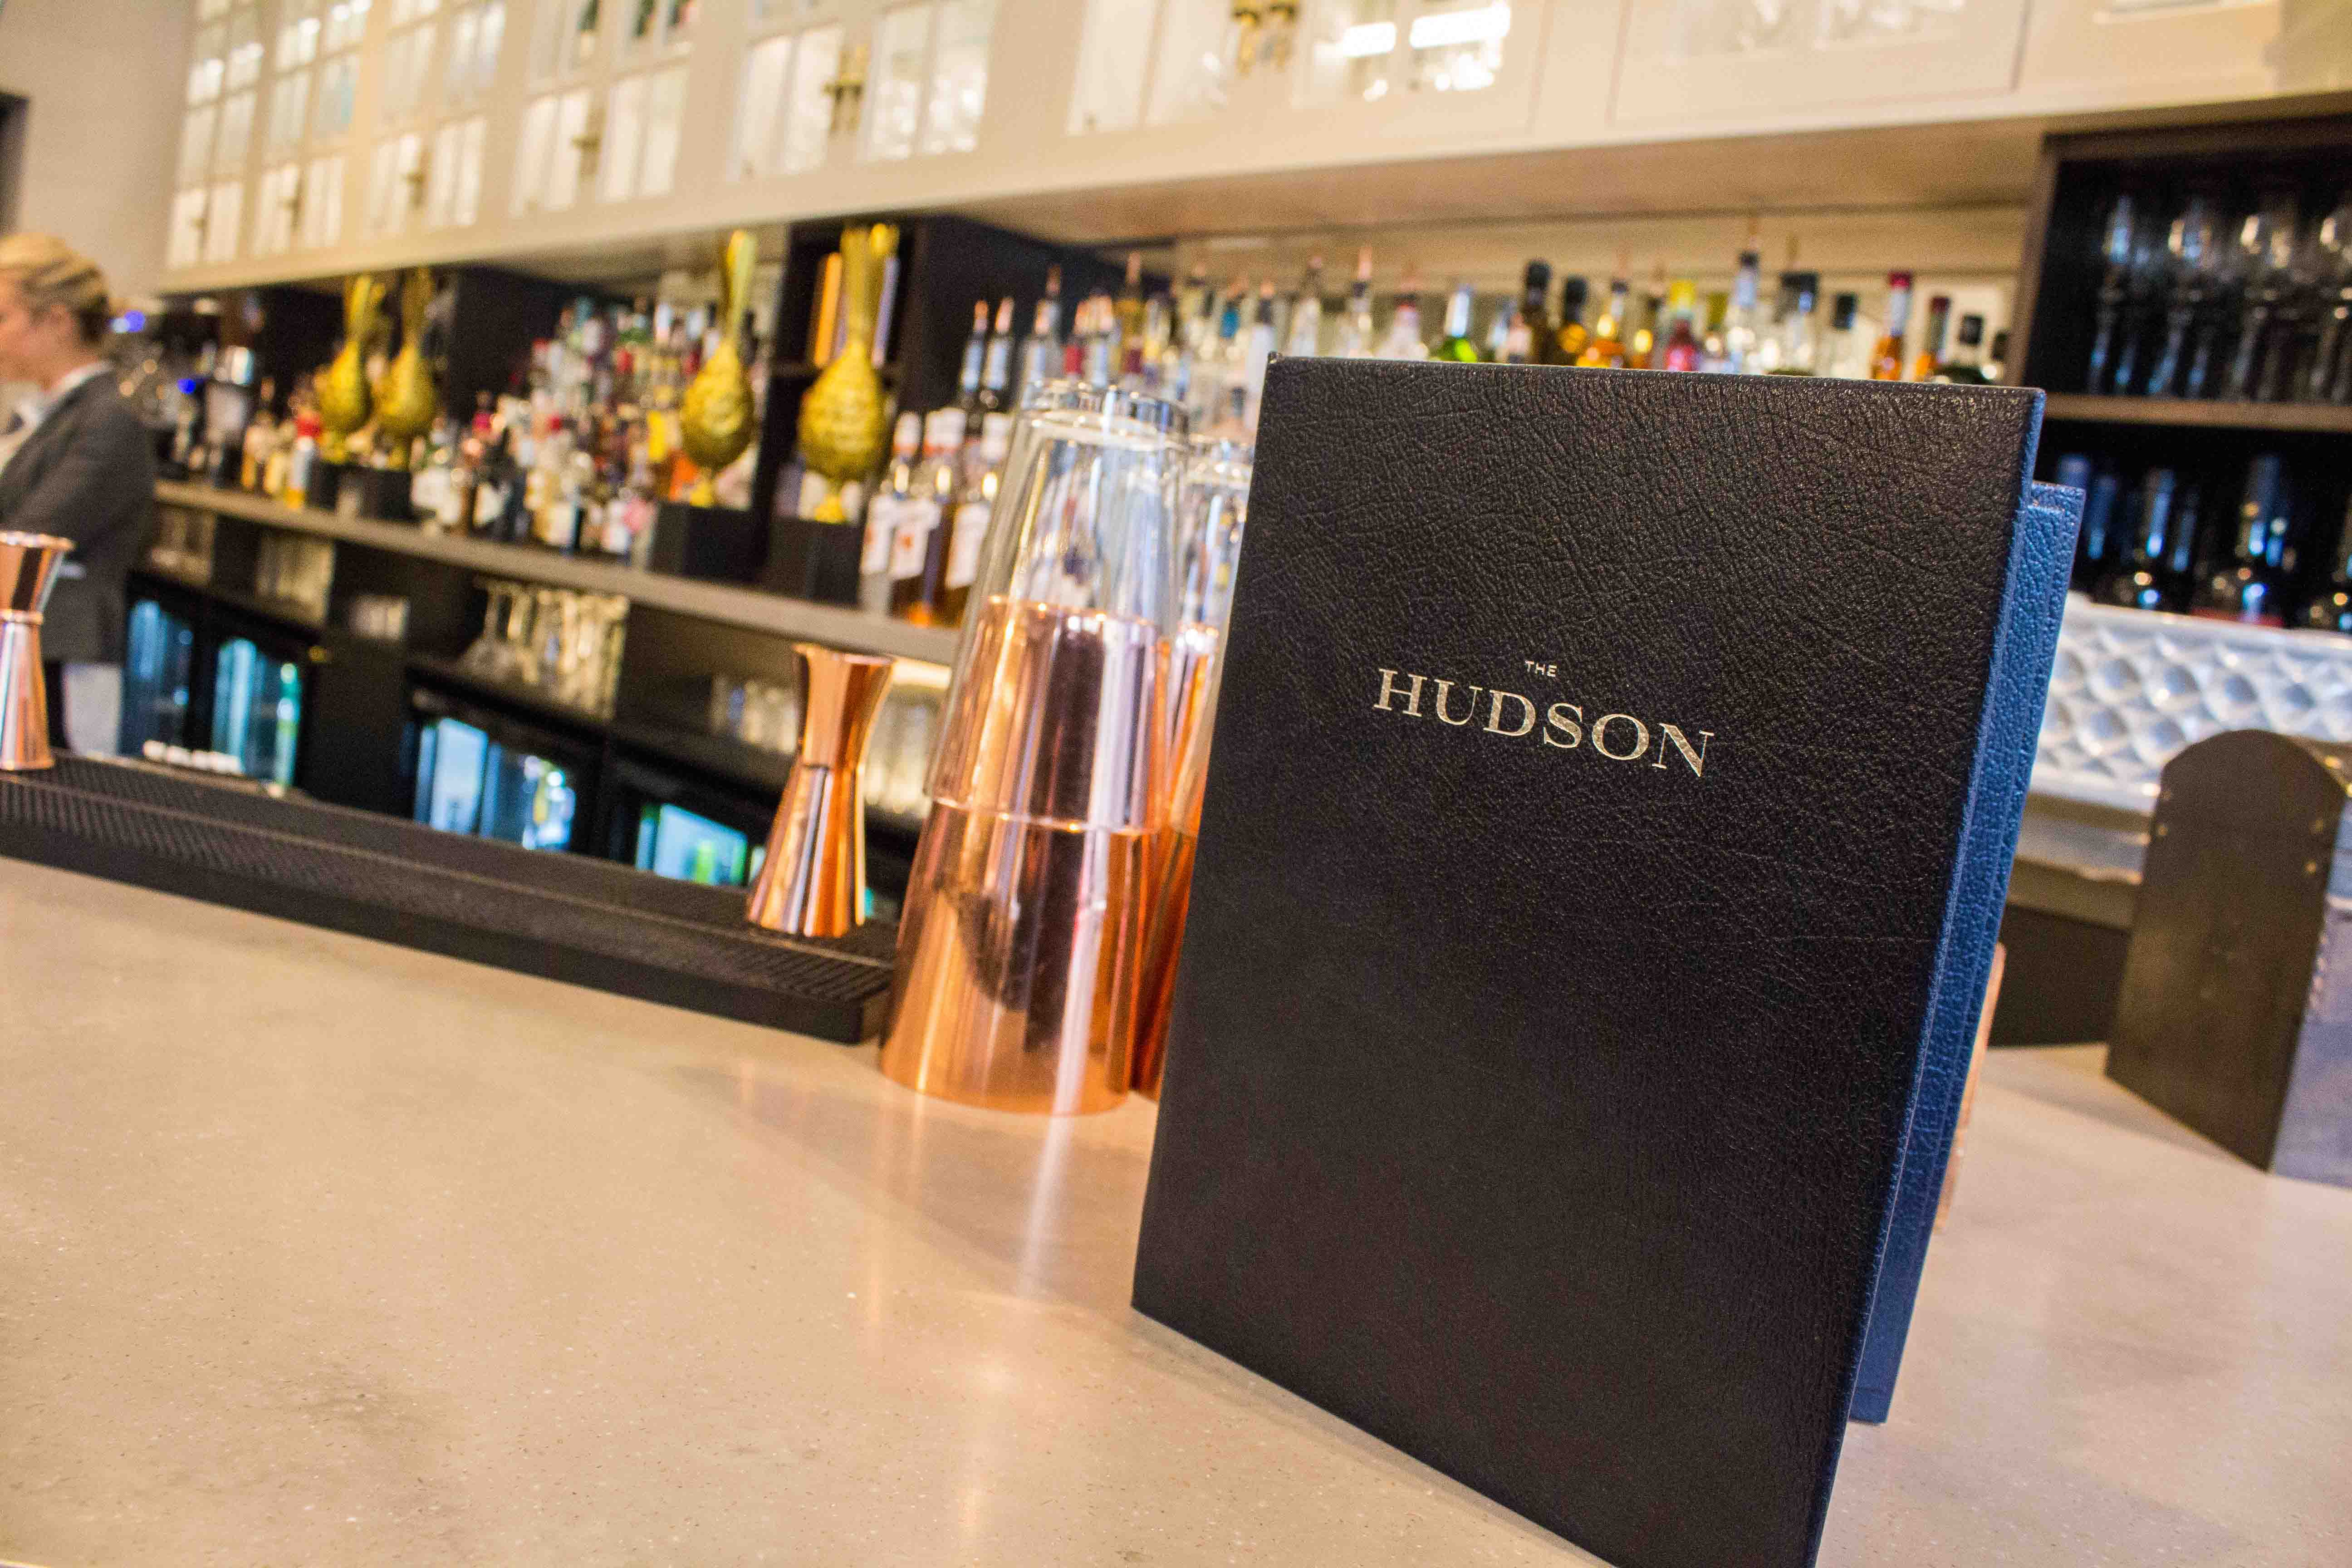 Hudson, County Hotel, GastroNorth Ltd